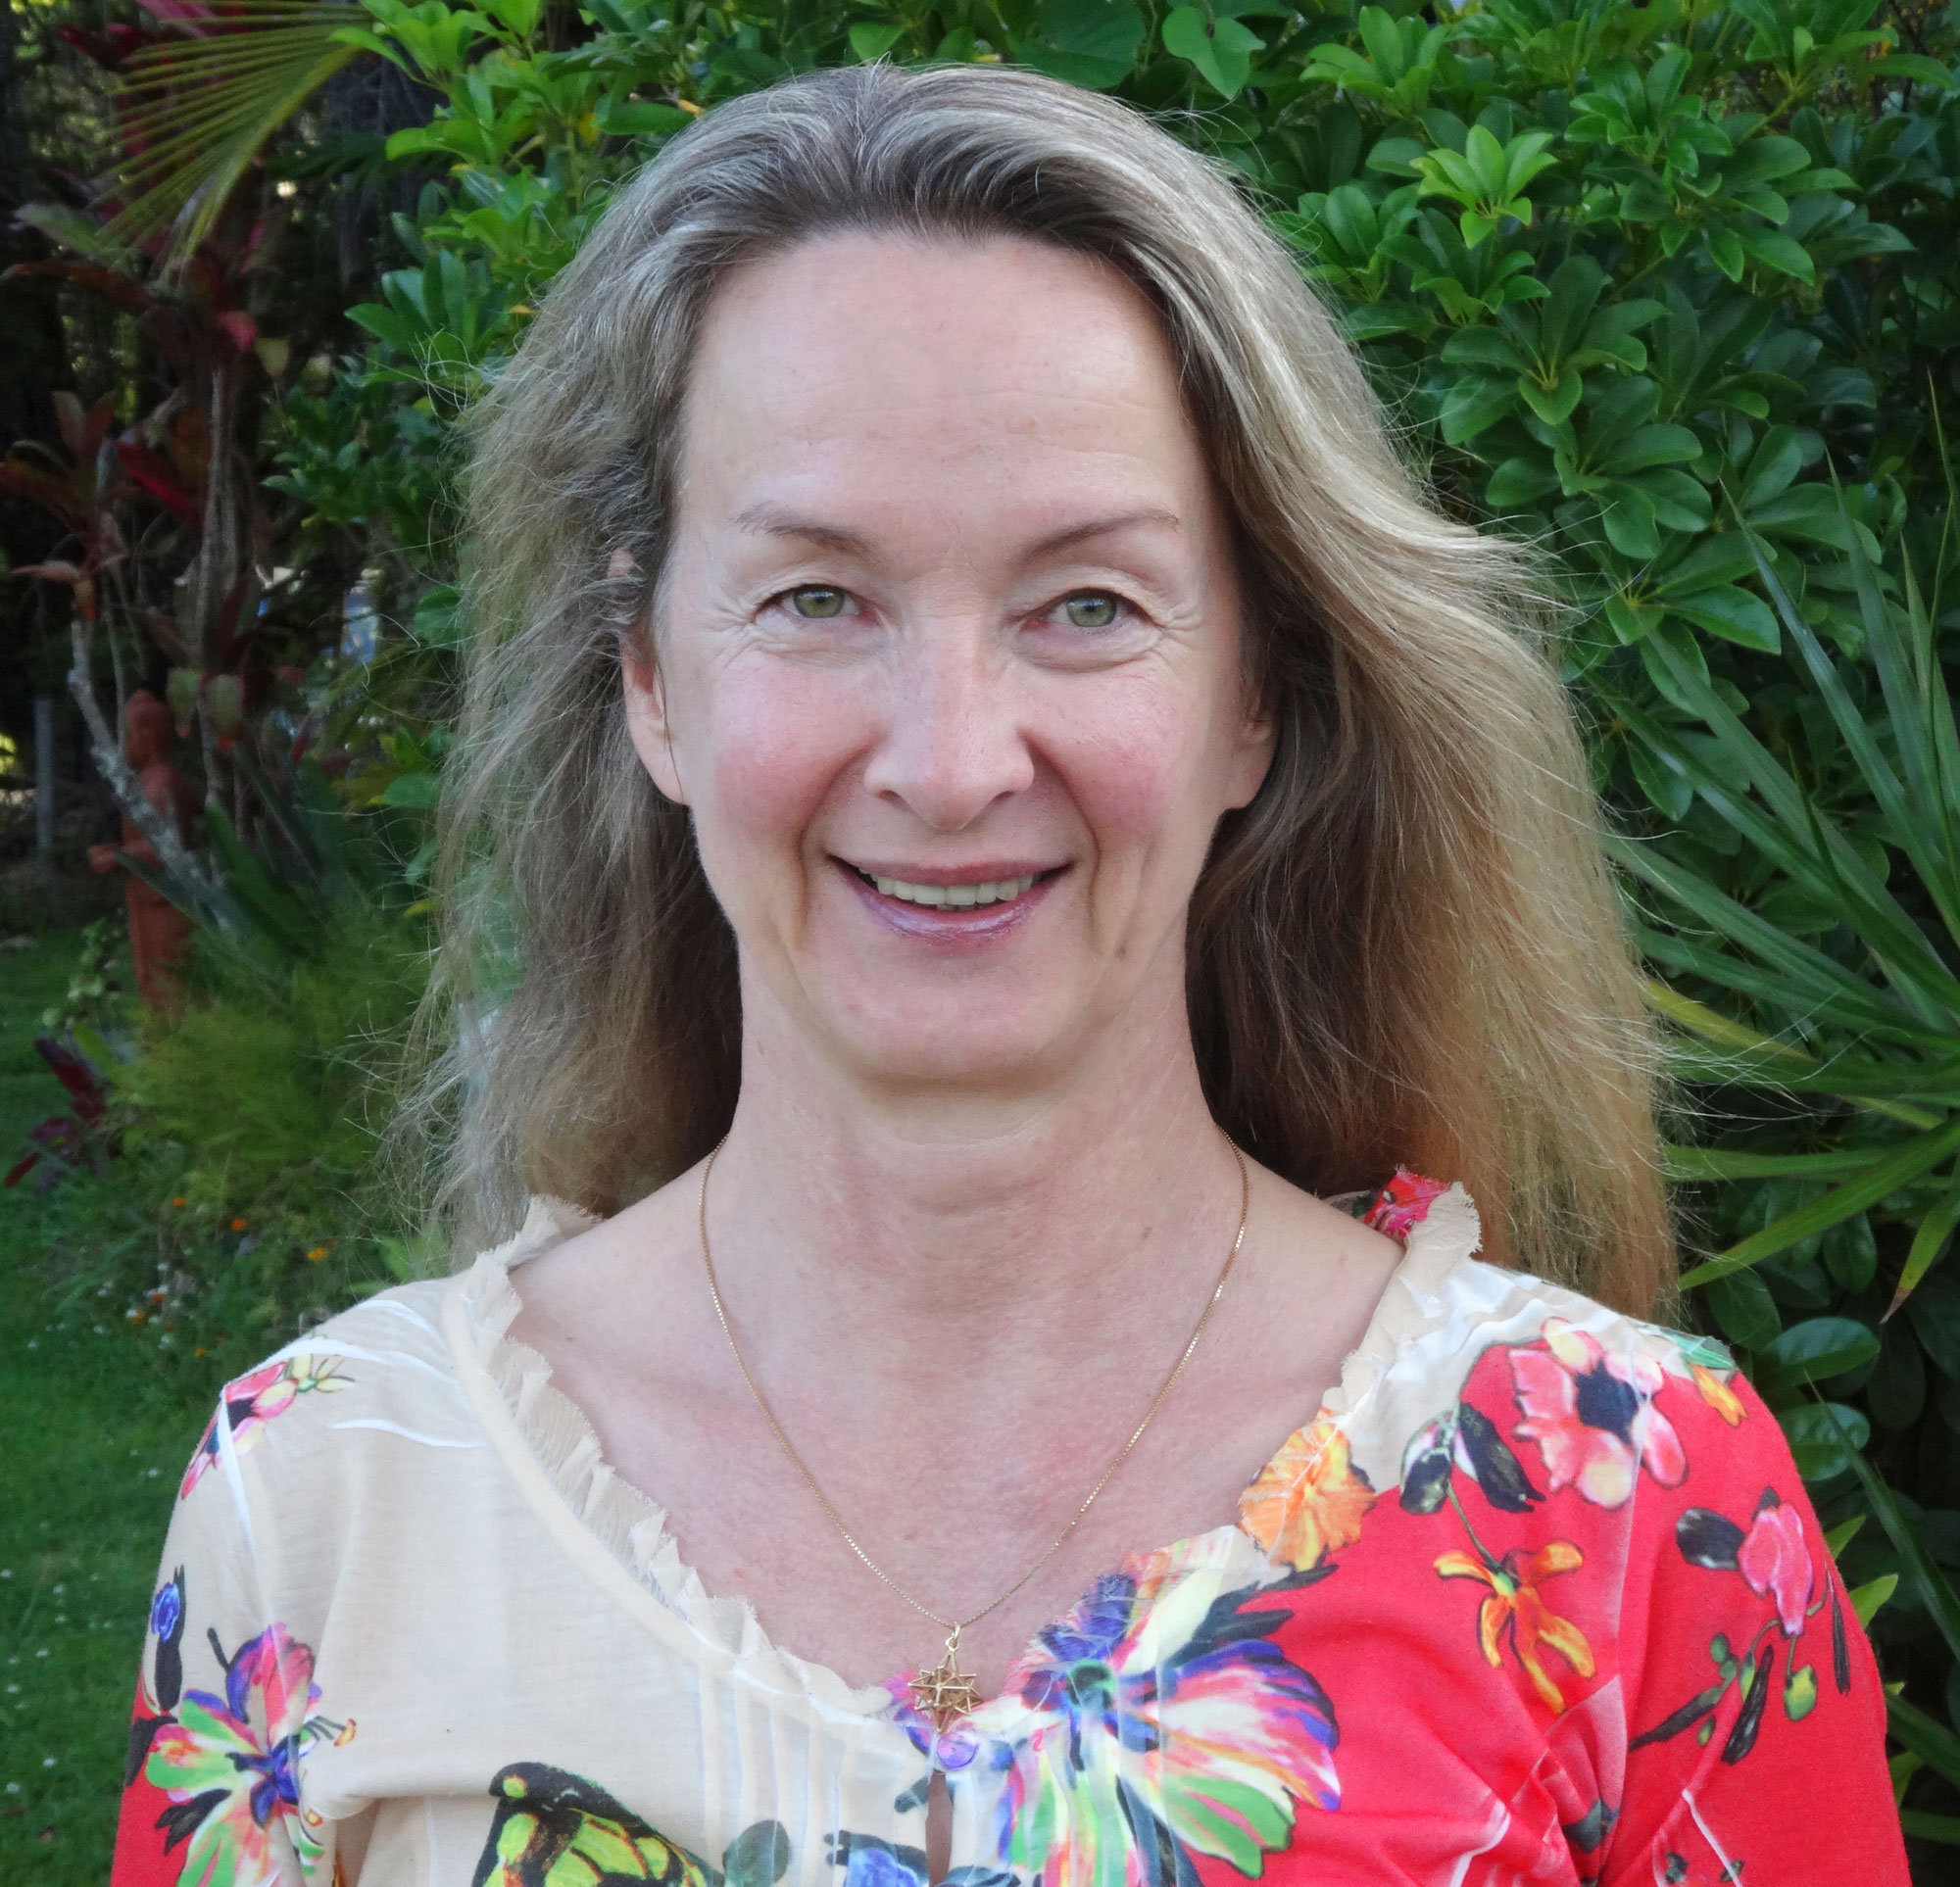 Vanamala Mayr-Reisch, Face Yoga teacher